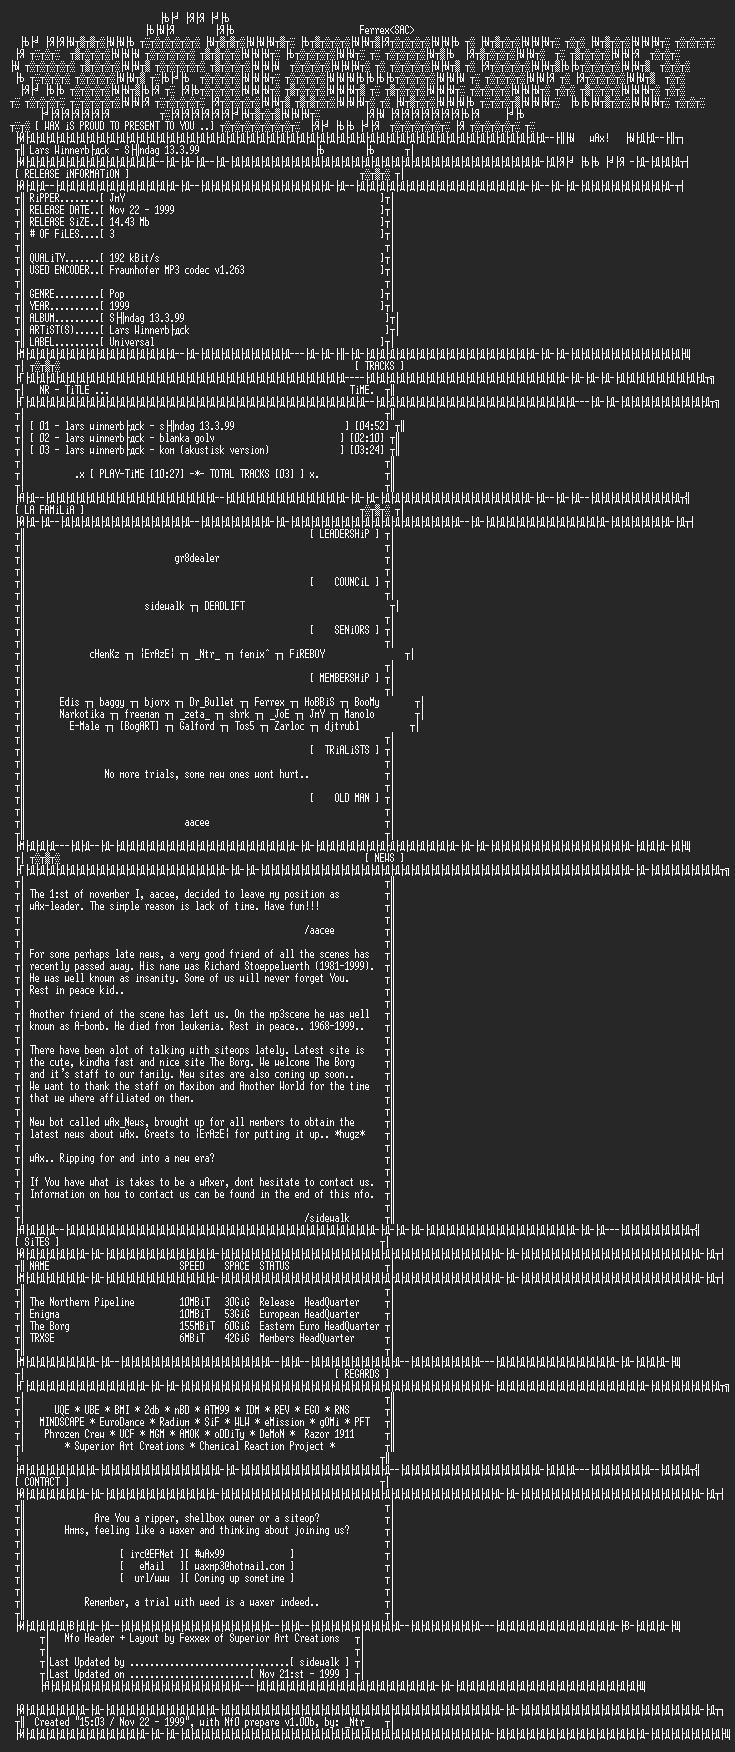 NFO file for Lars_Winnerback-Soendag13399-1999-WAX